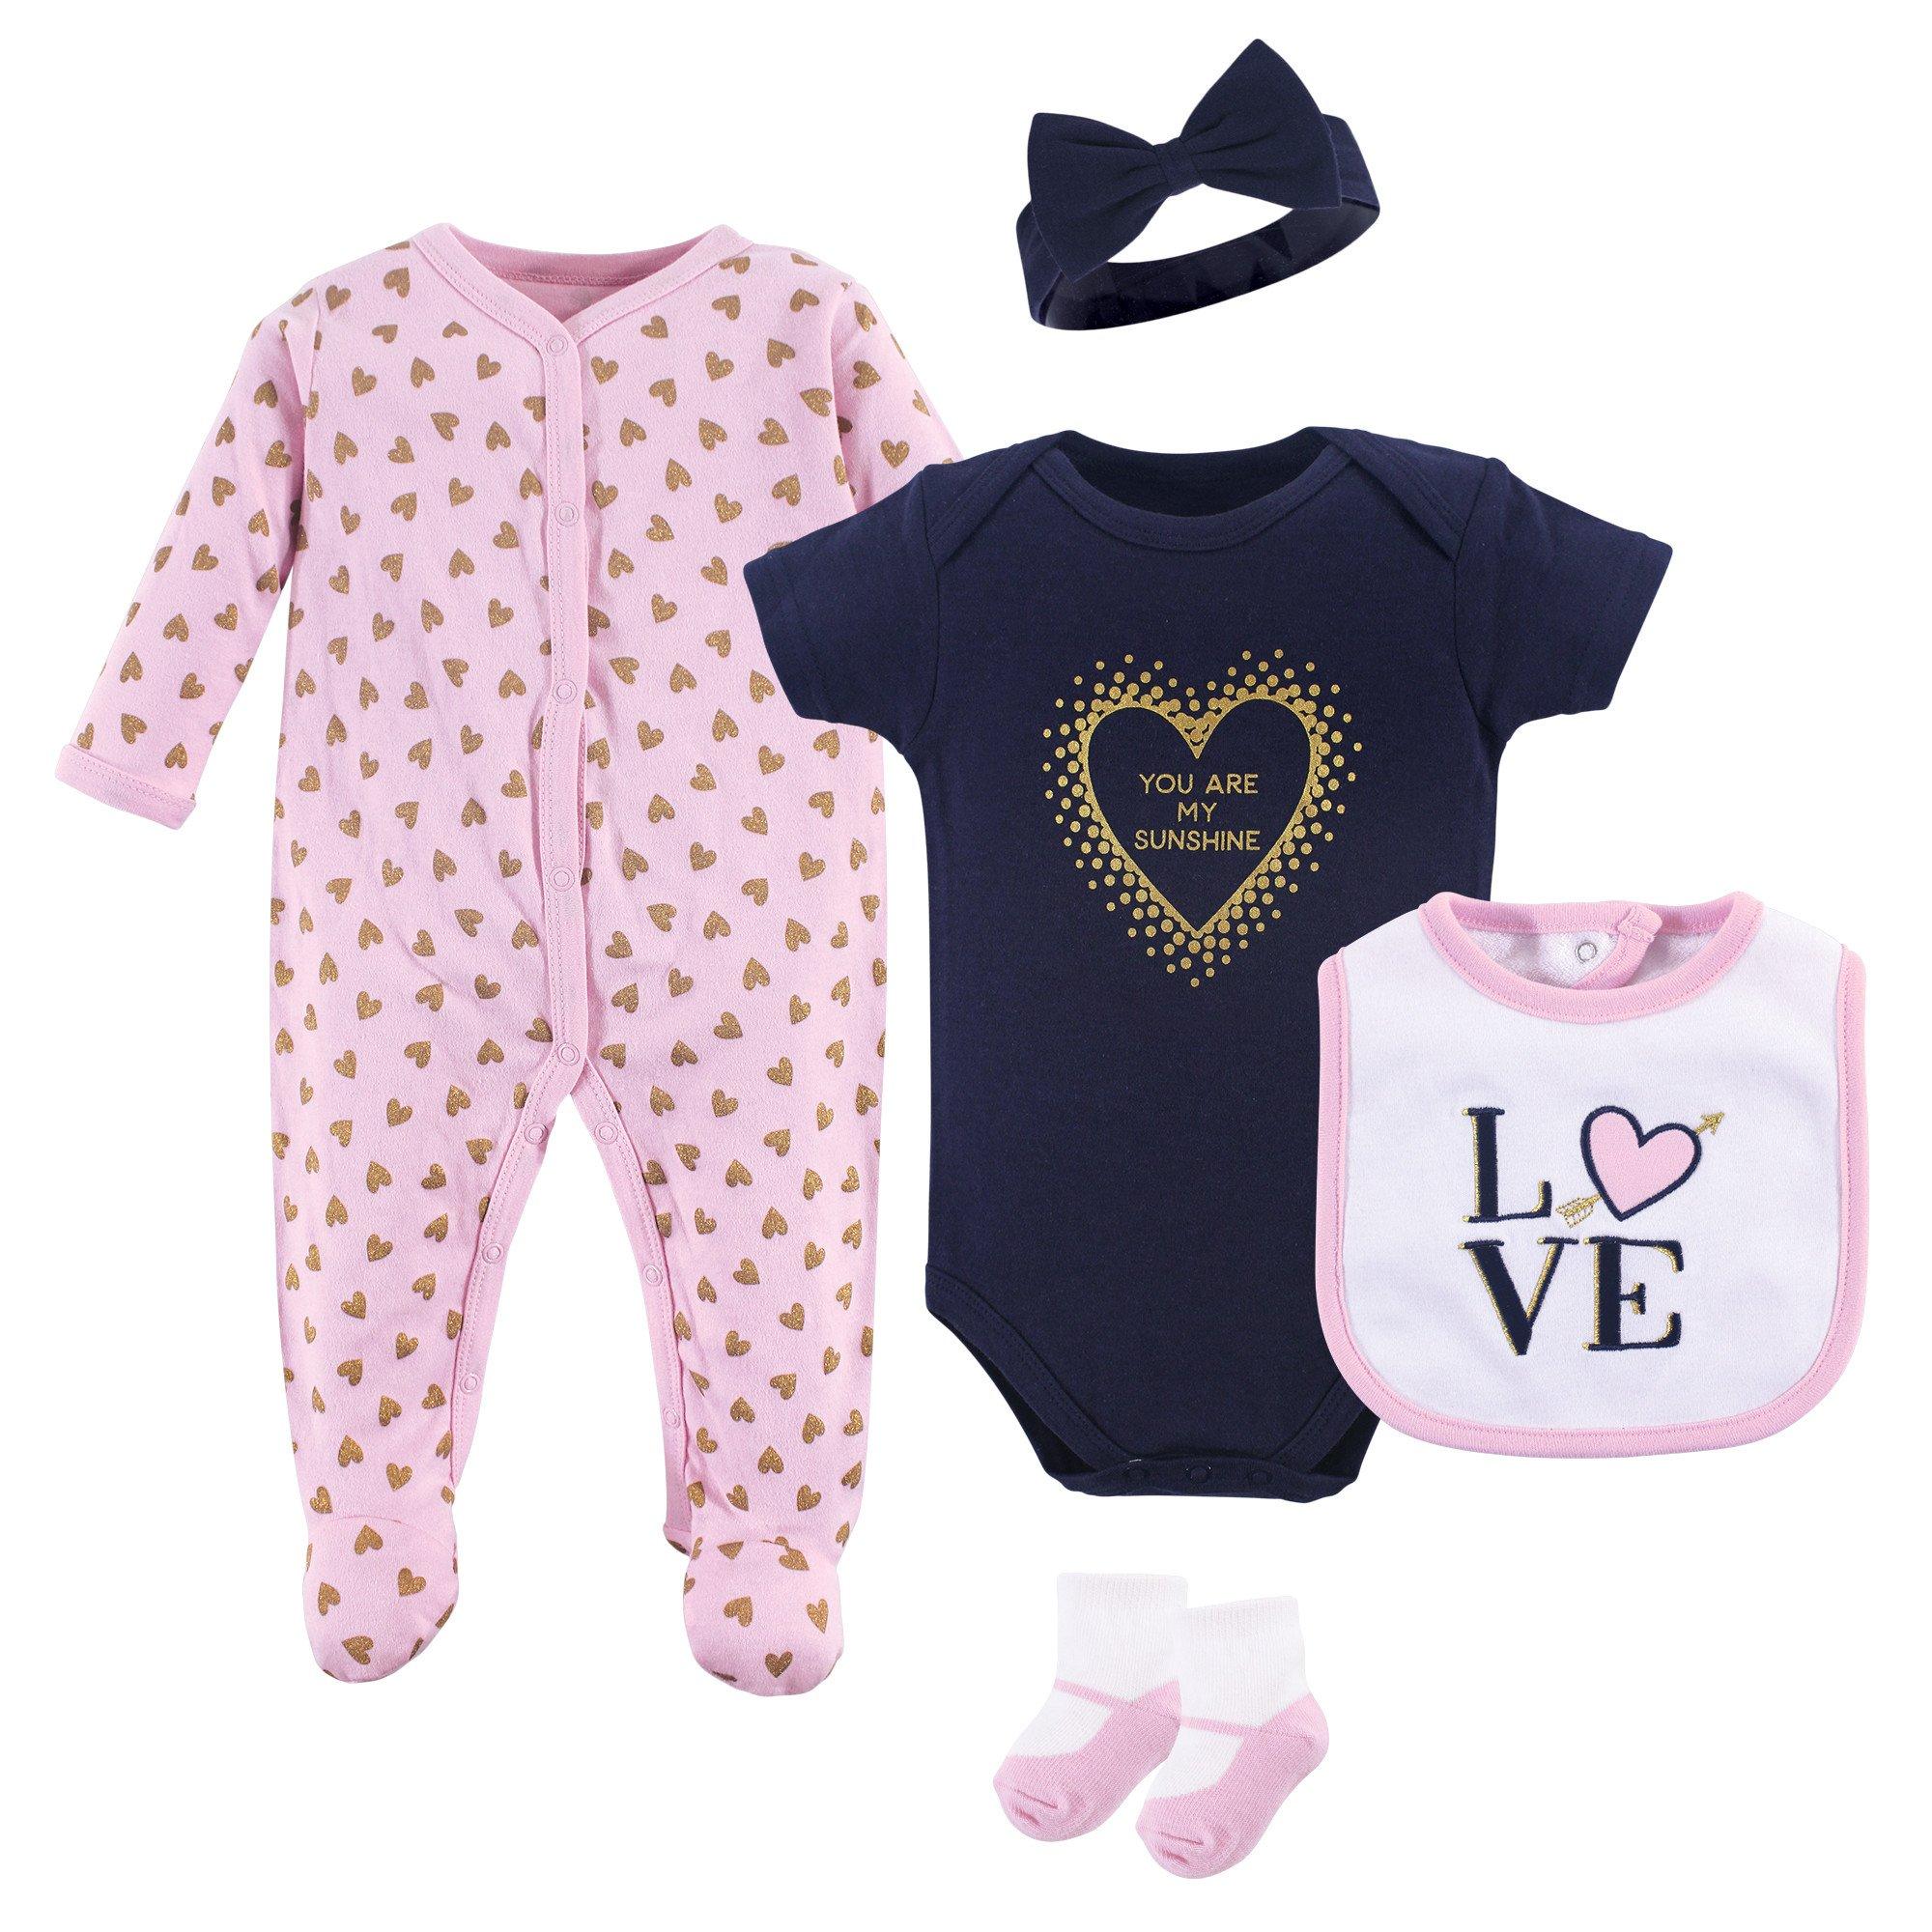 Hudson Baby Multi Piece Clothing Set, Love 5, 6-9 Months